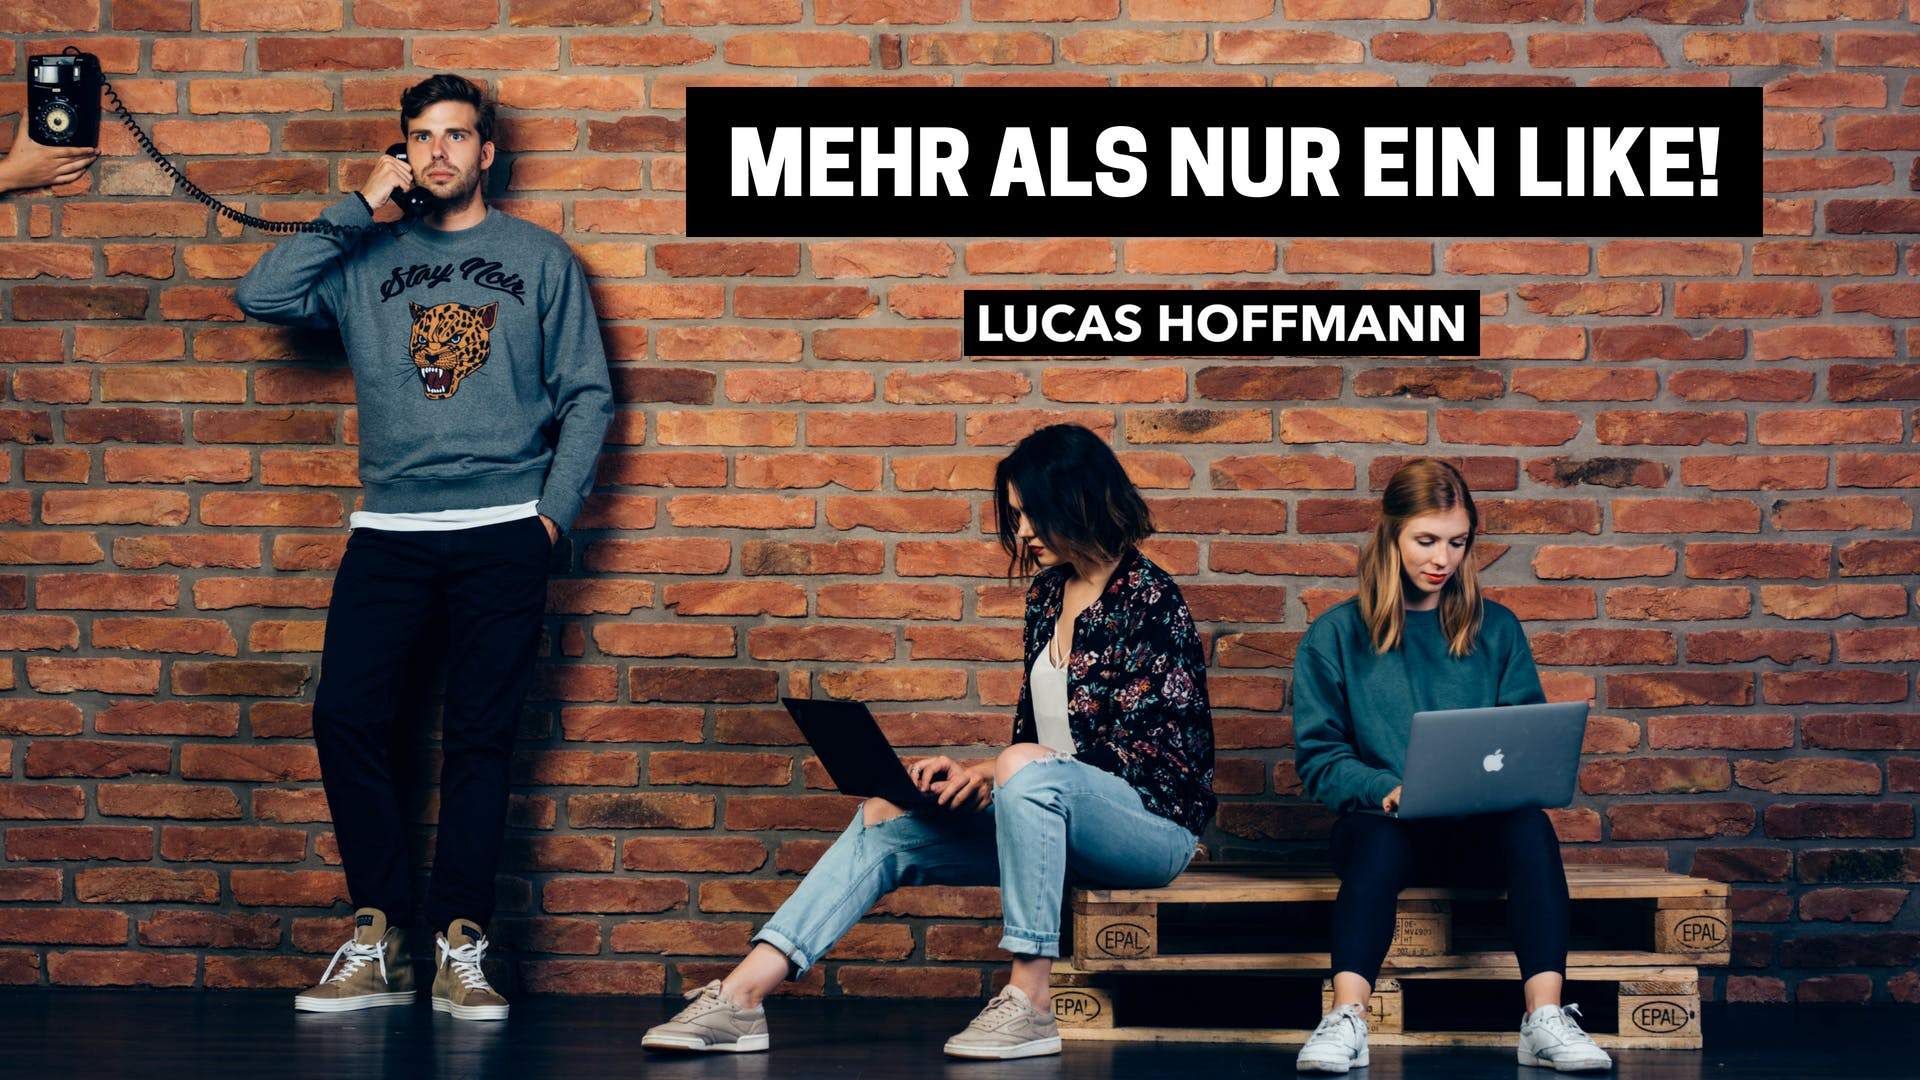 MEHR ALS NUR EIN LIKE! Social Media Marketing Bootcamp NÜRNBERG 09.11.2019